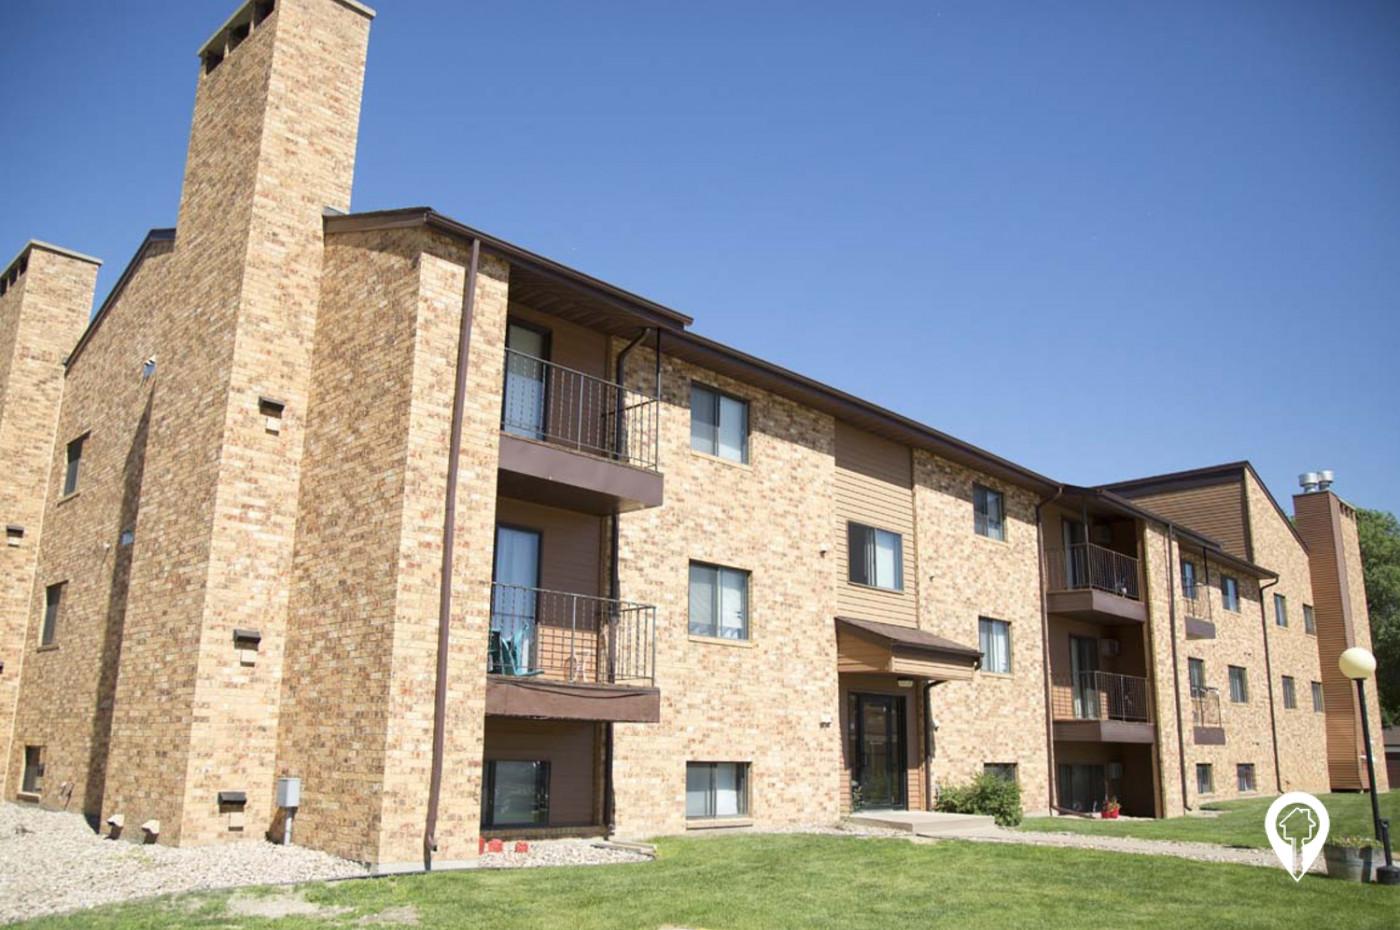 Westwood park apartment homes in bismarck nd - 3 bedroom apartments in bismarck nd ...